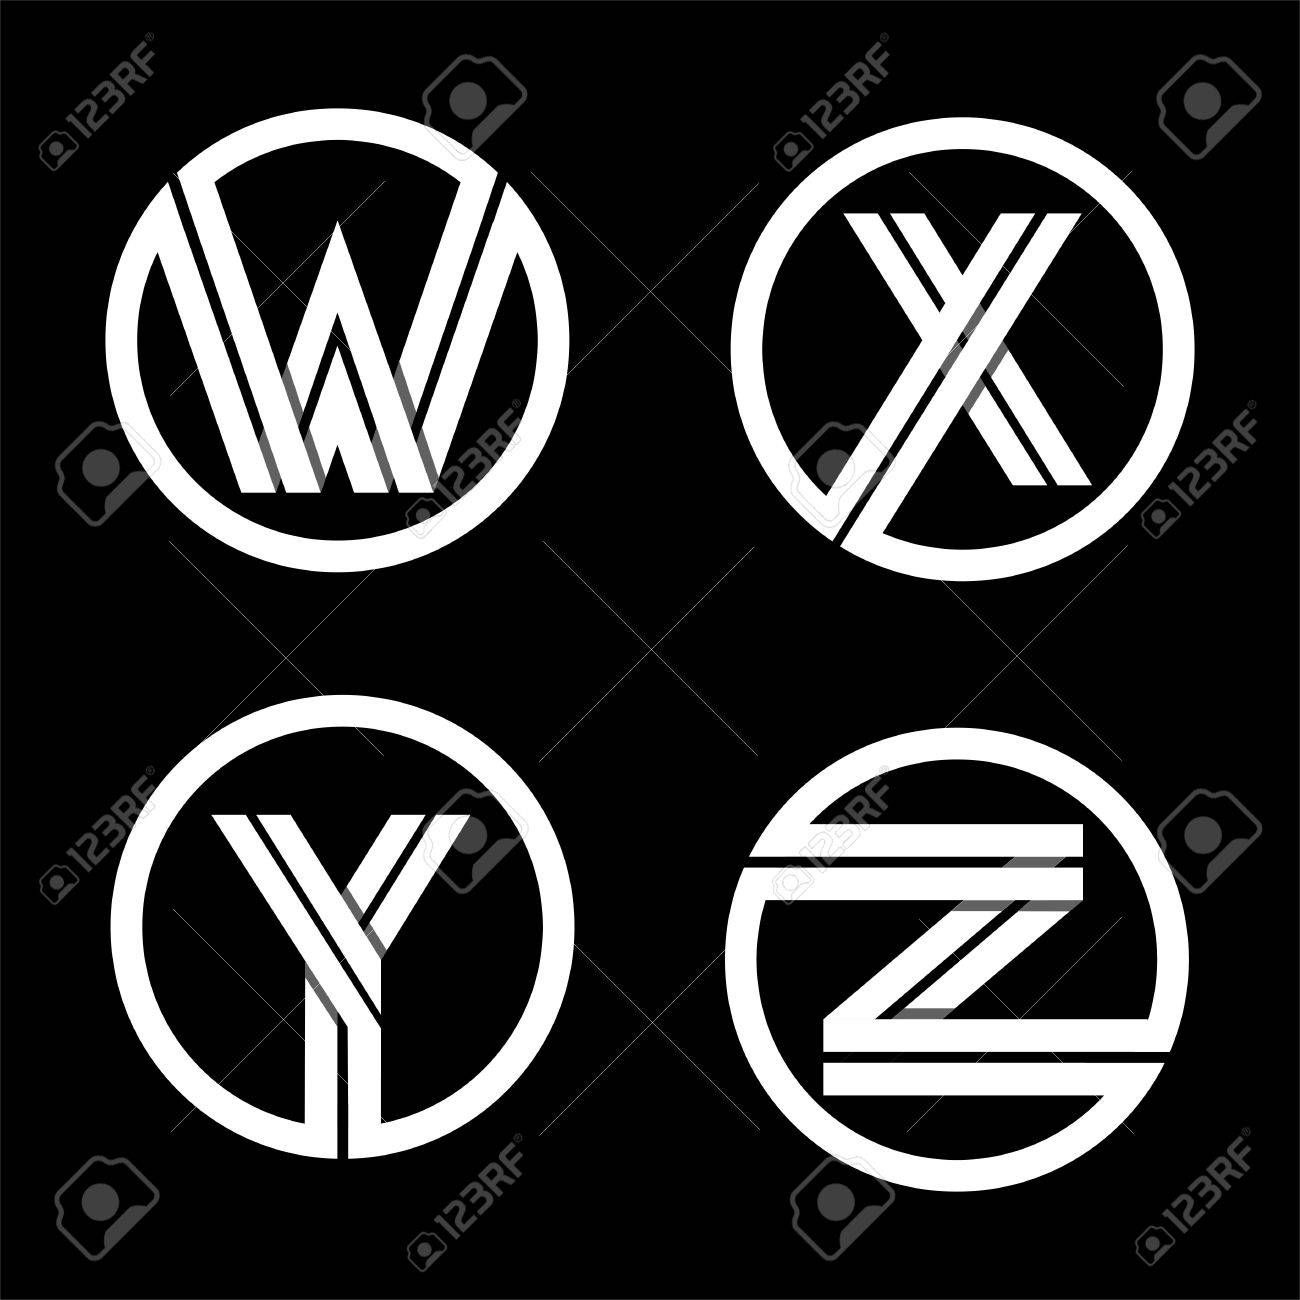 Capital letters W, X, Y, Z. From double white stripe in a